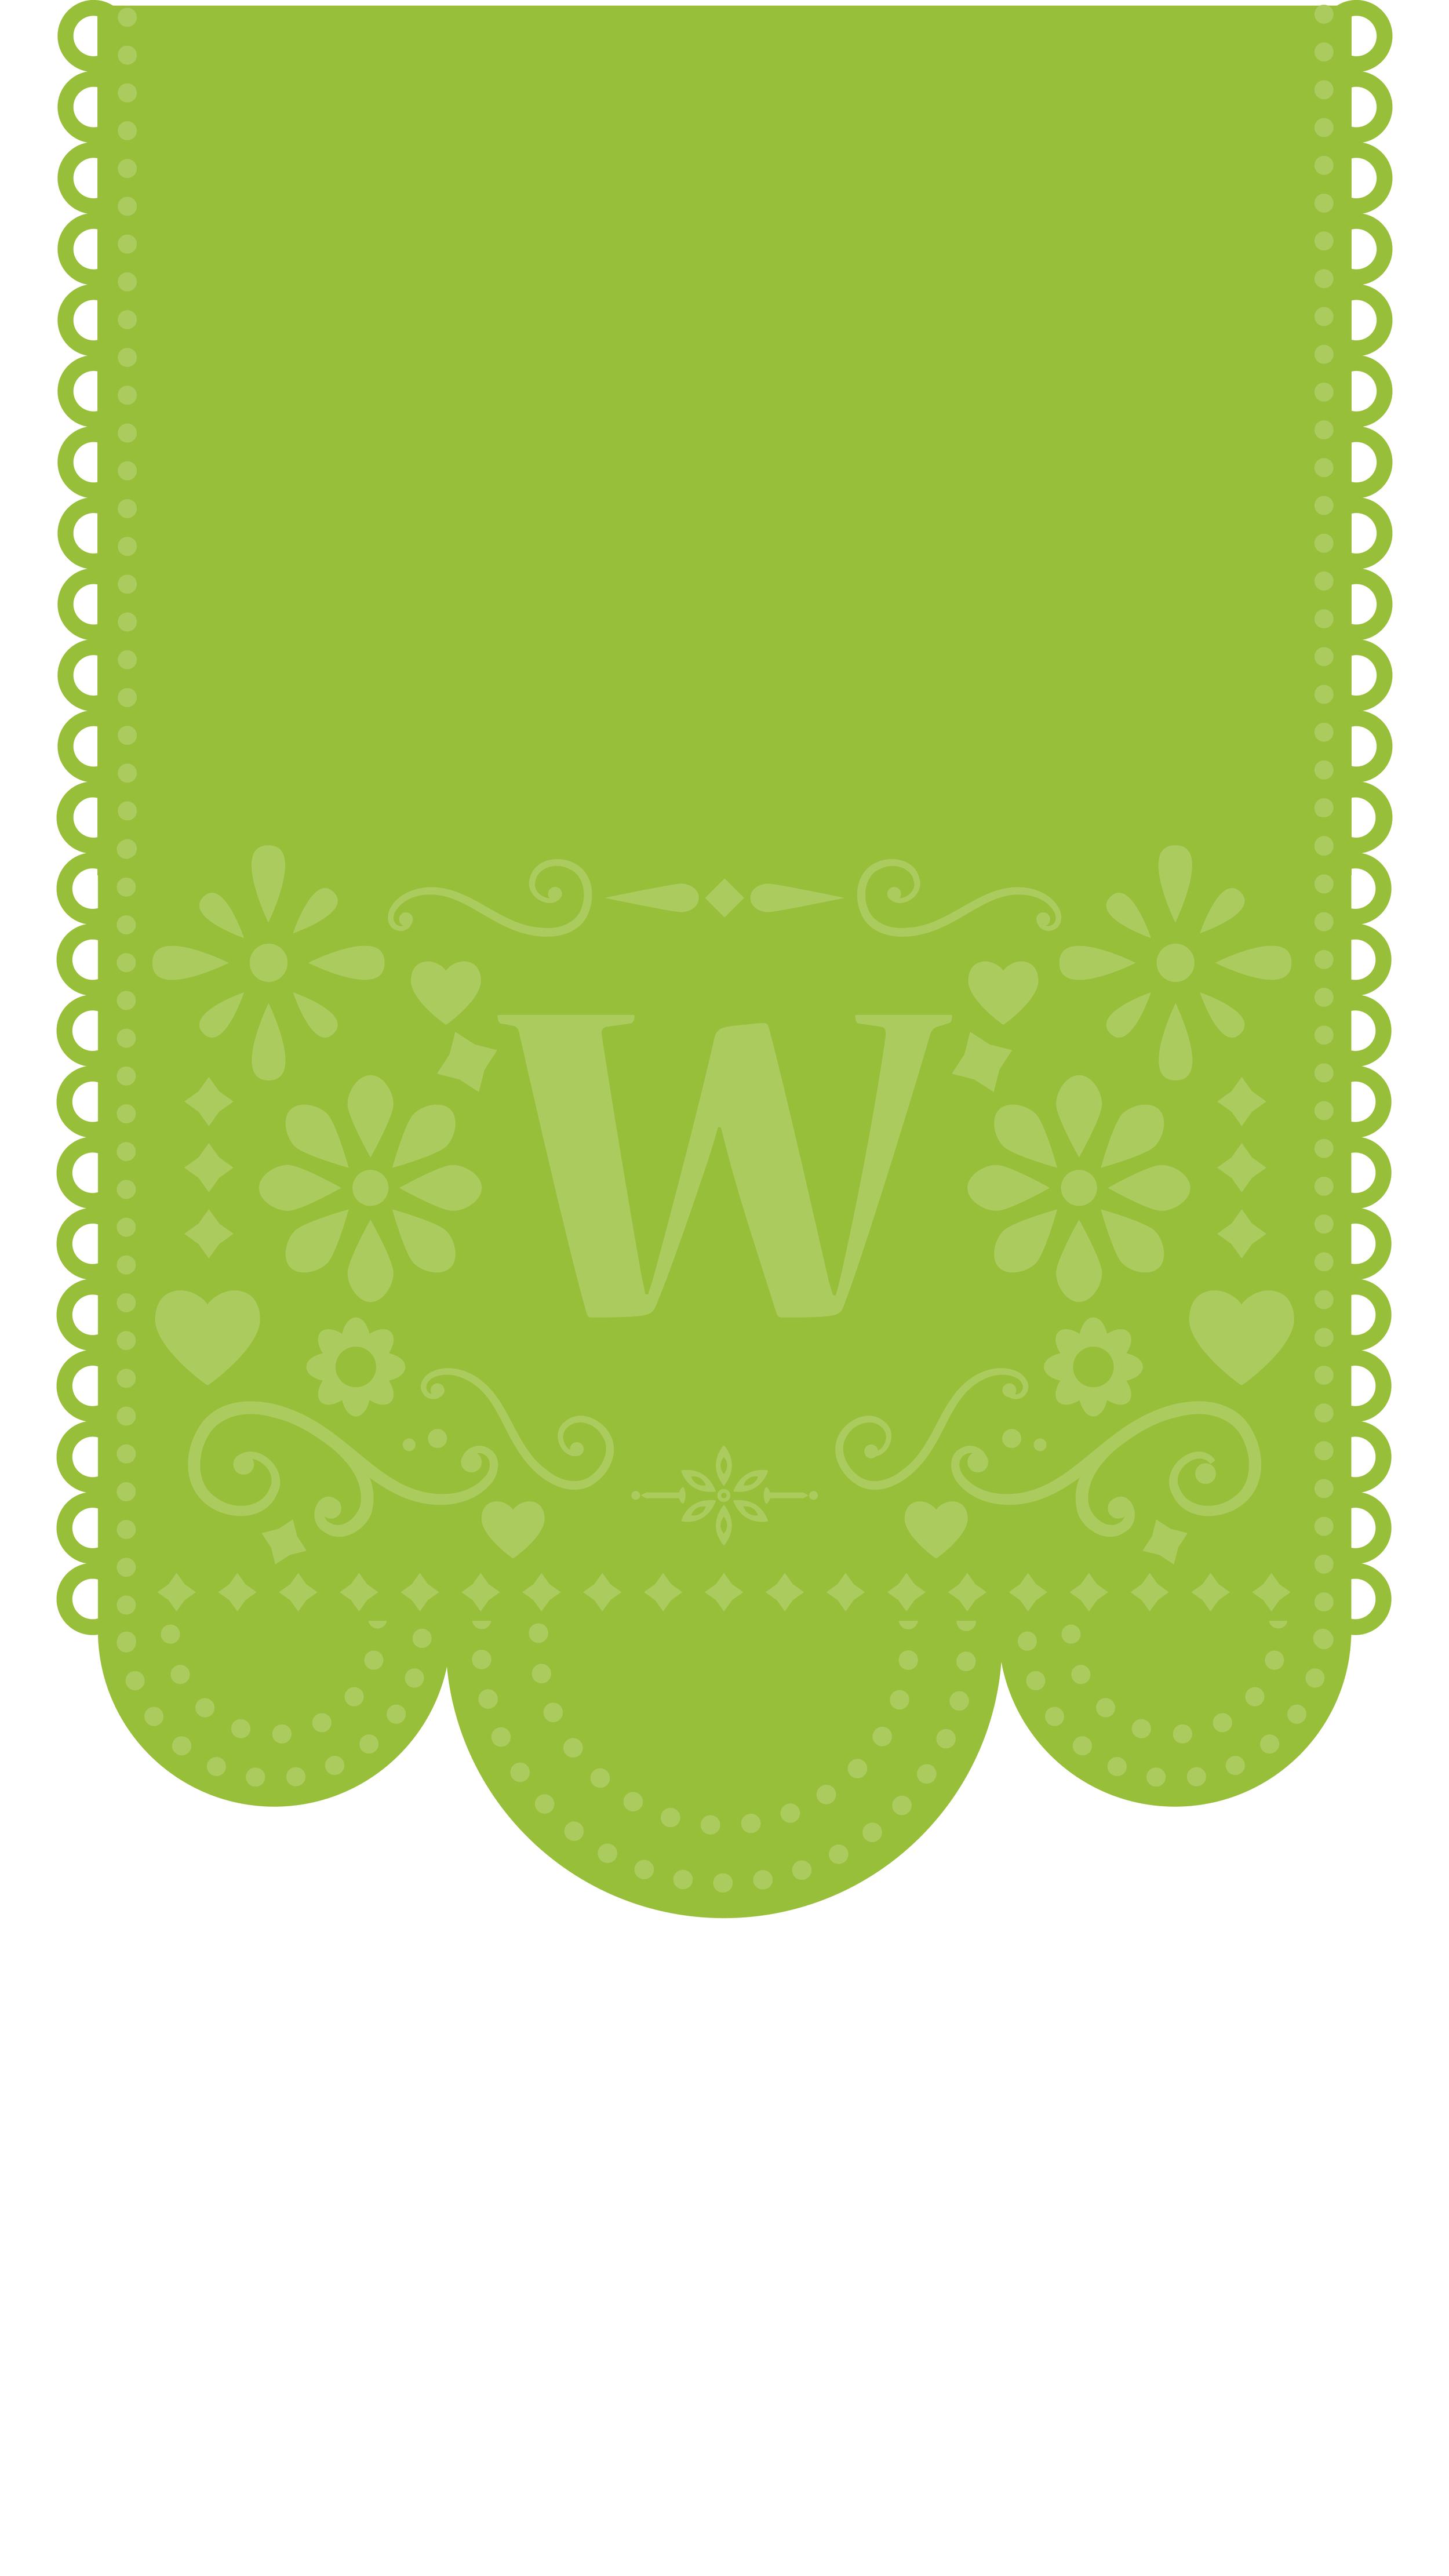 w-fiesta-banner.png